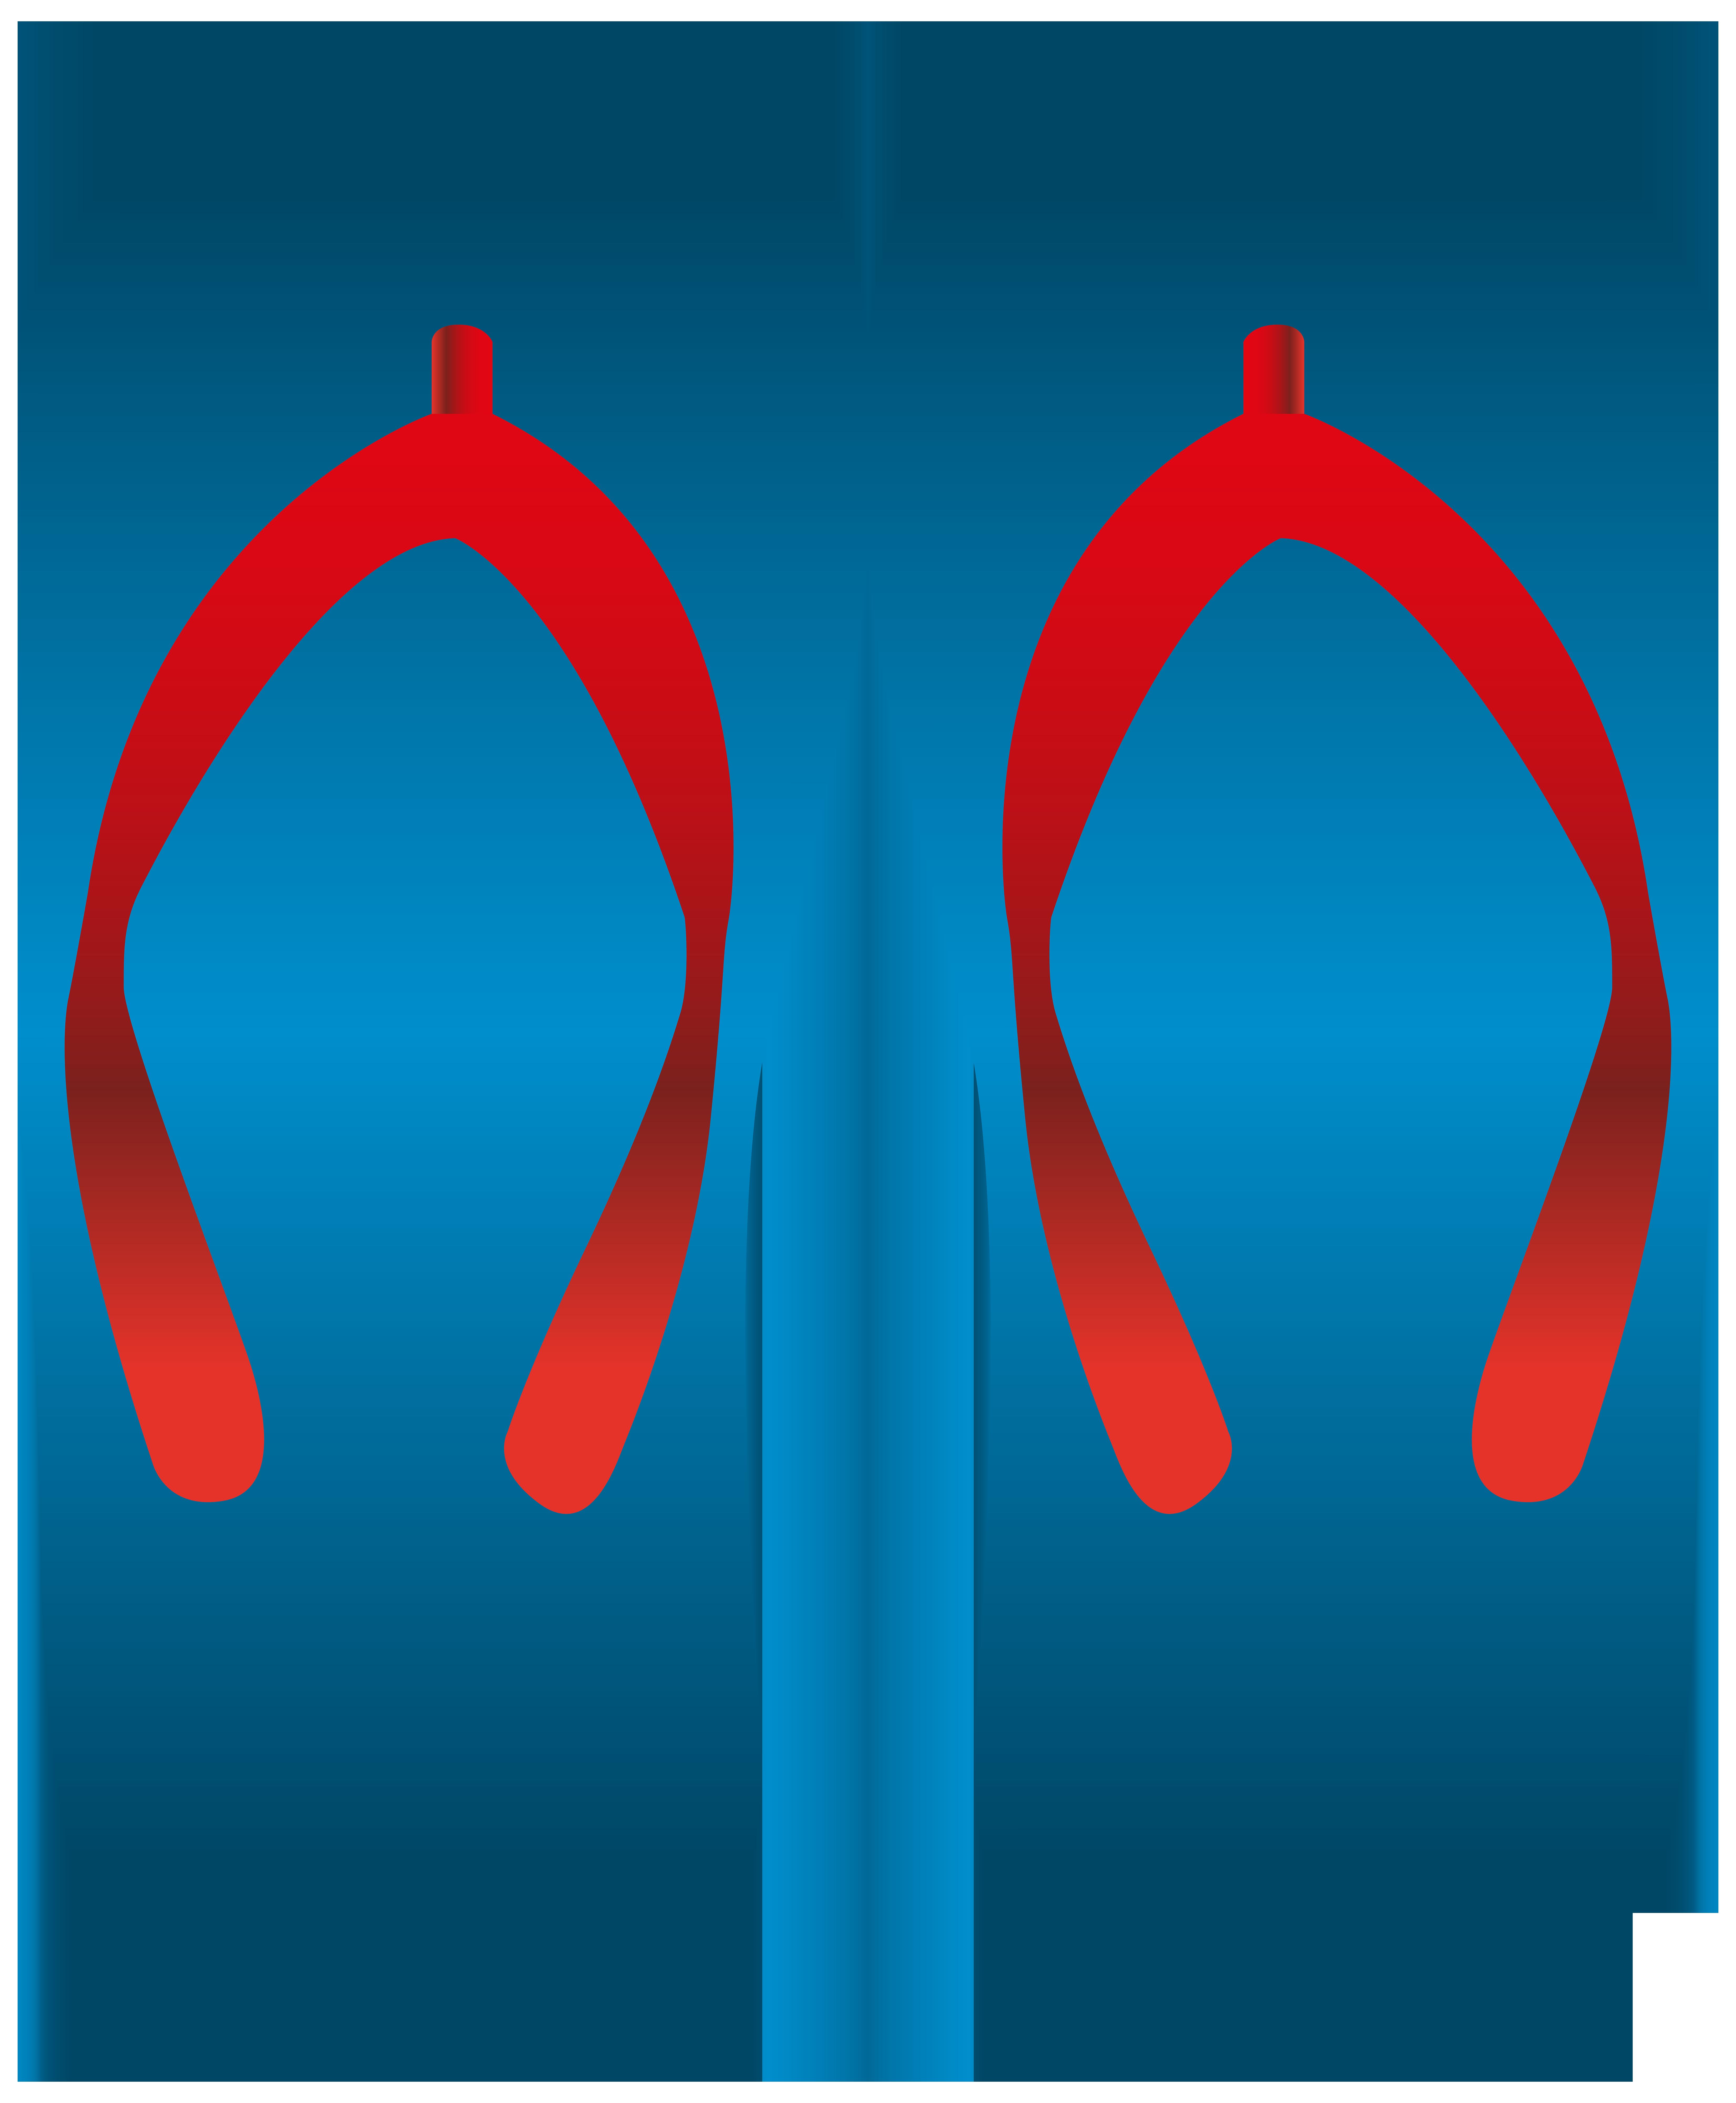 vector royalty free download Flip flops clipart. Blue png clip art.